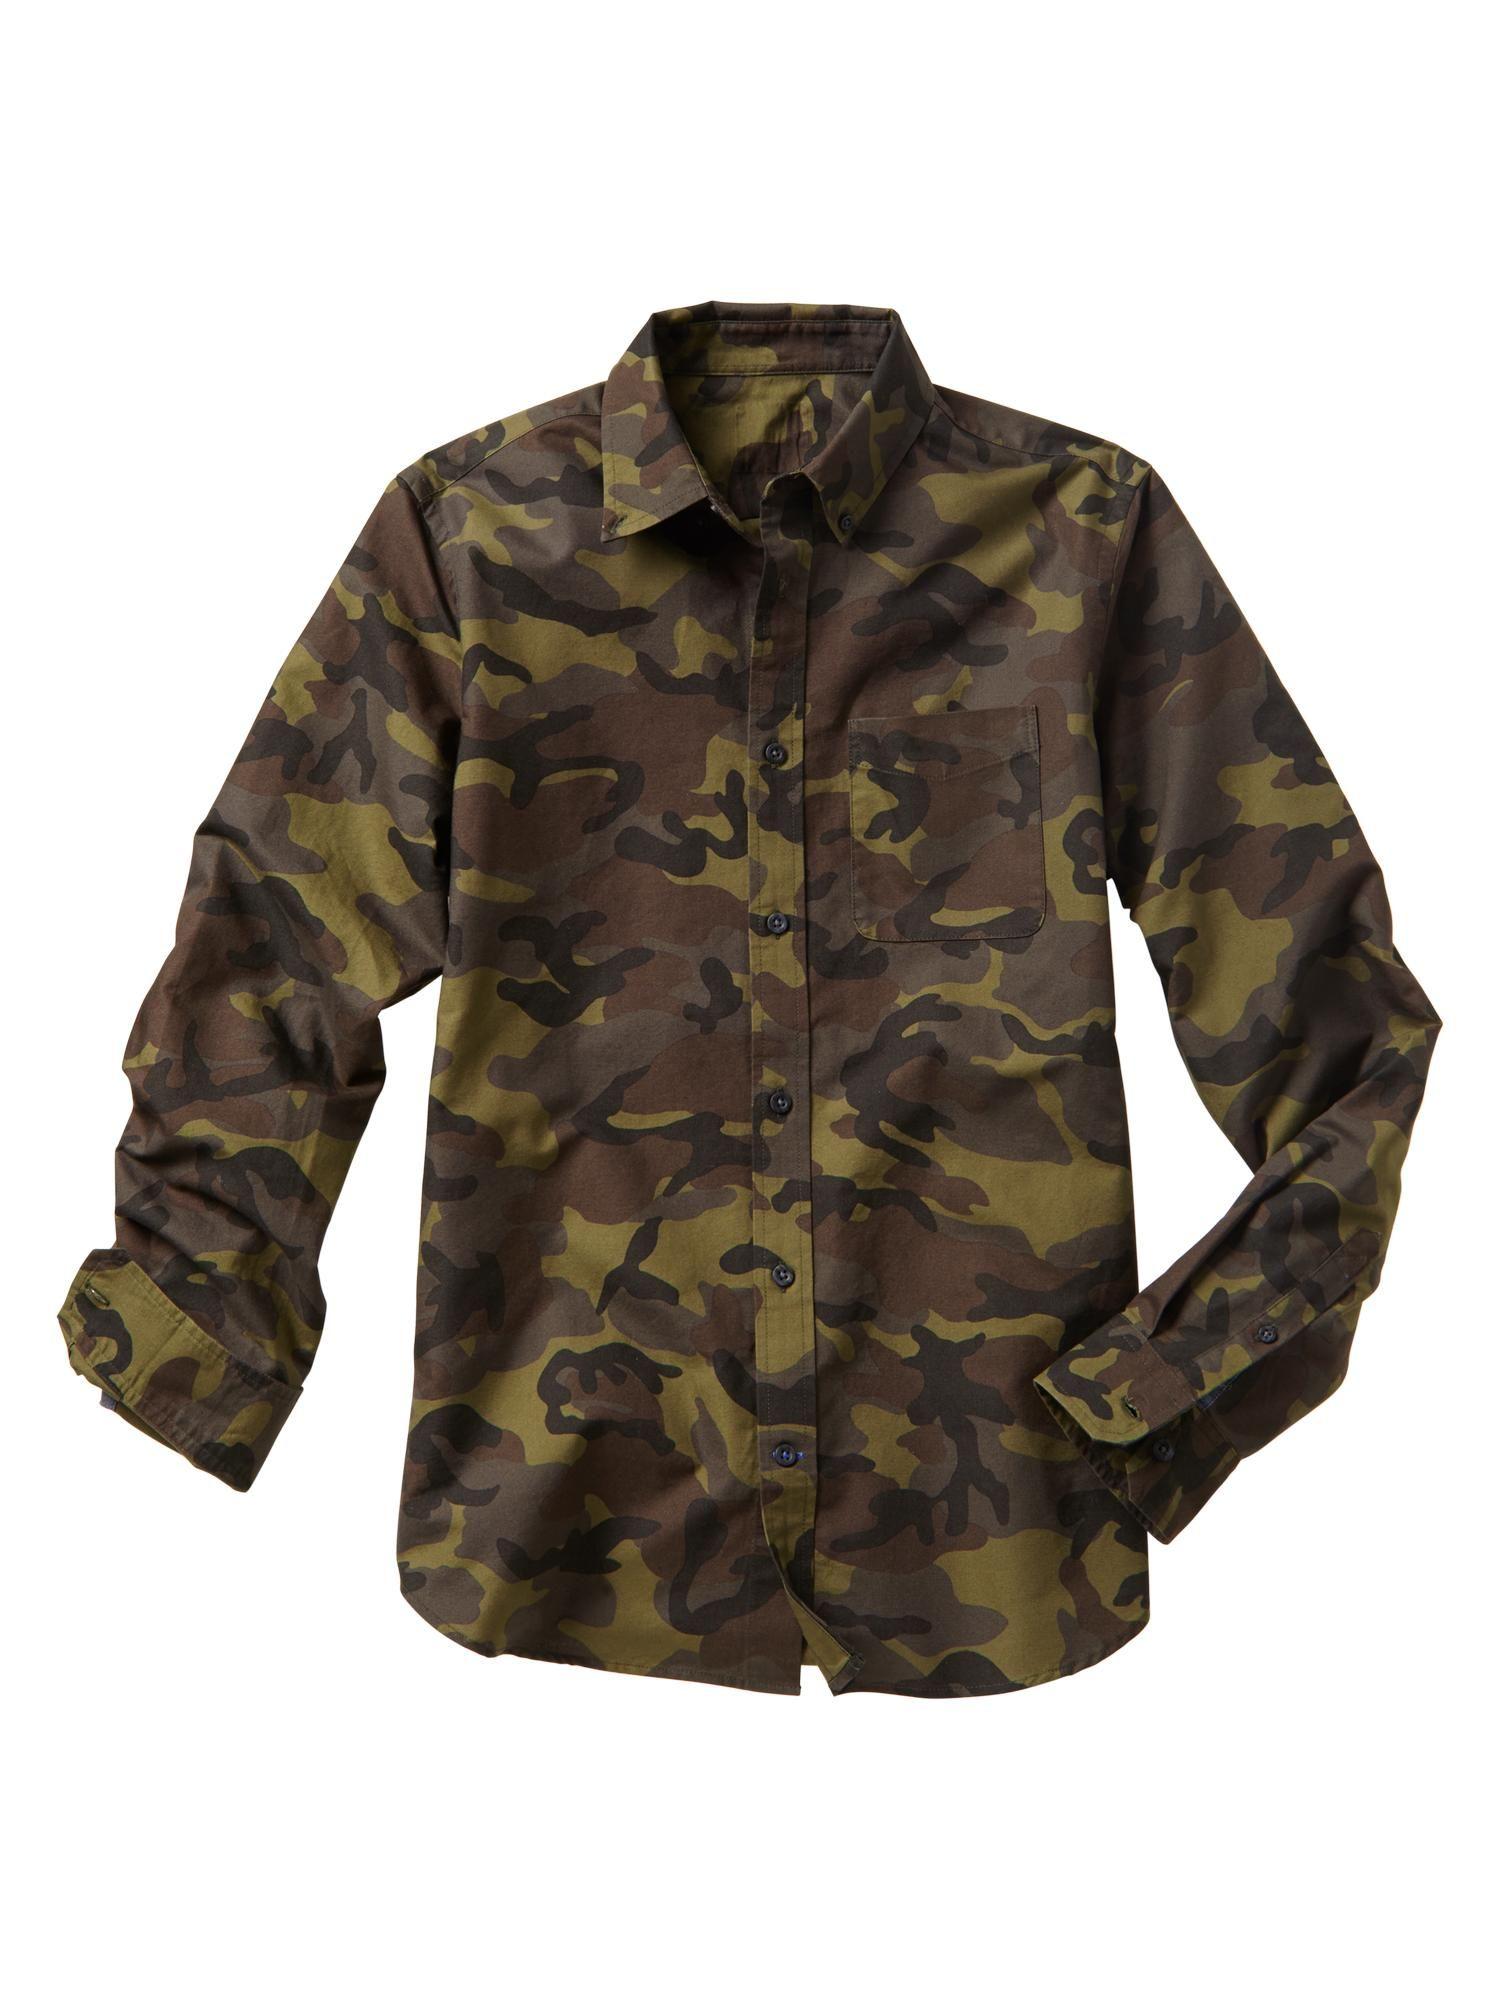 3371dc3fd Camo Shirt For Sale - DREAMWORKS